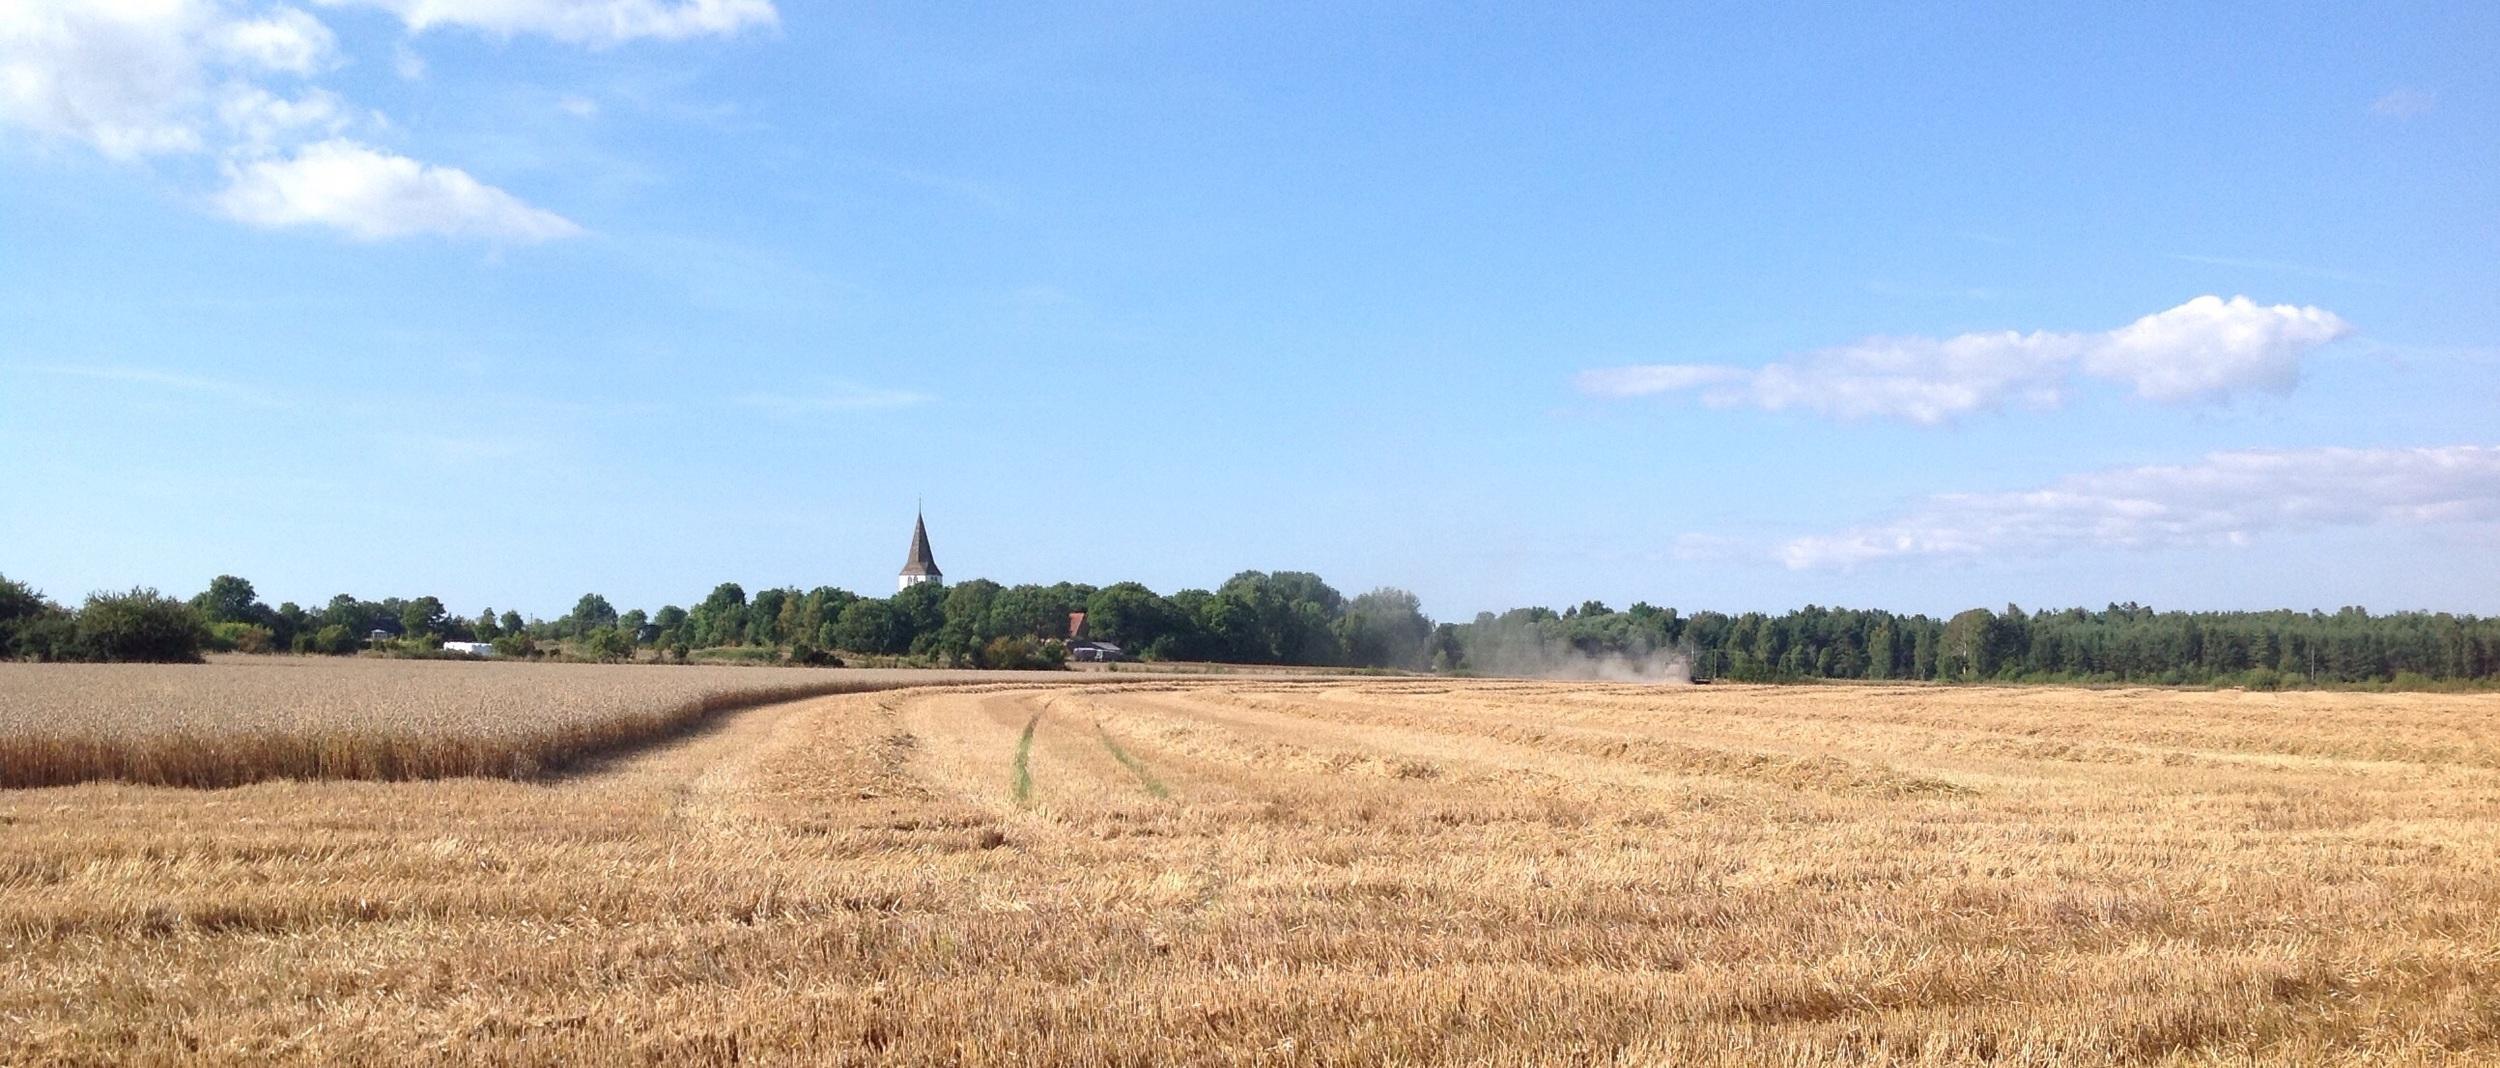 Looking toward Levide church, combine half way through the field.